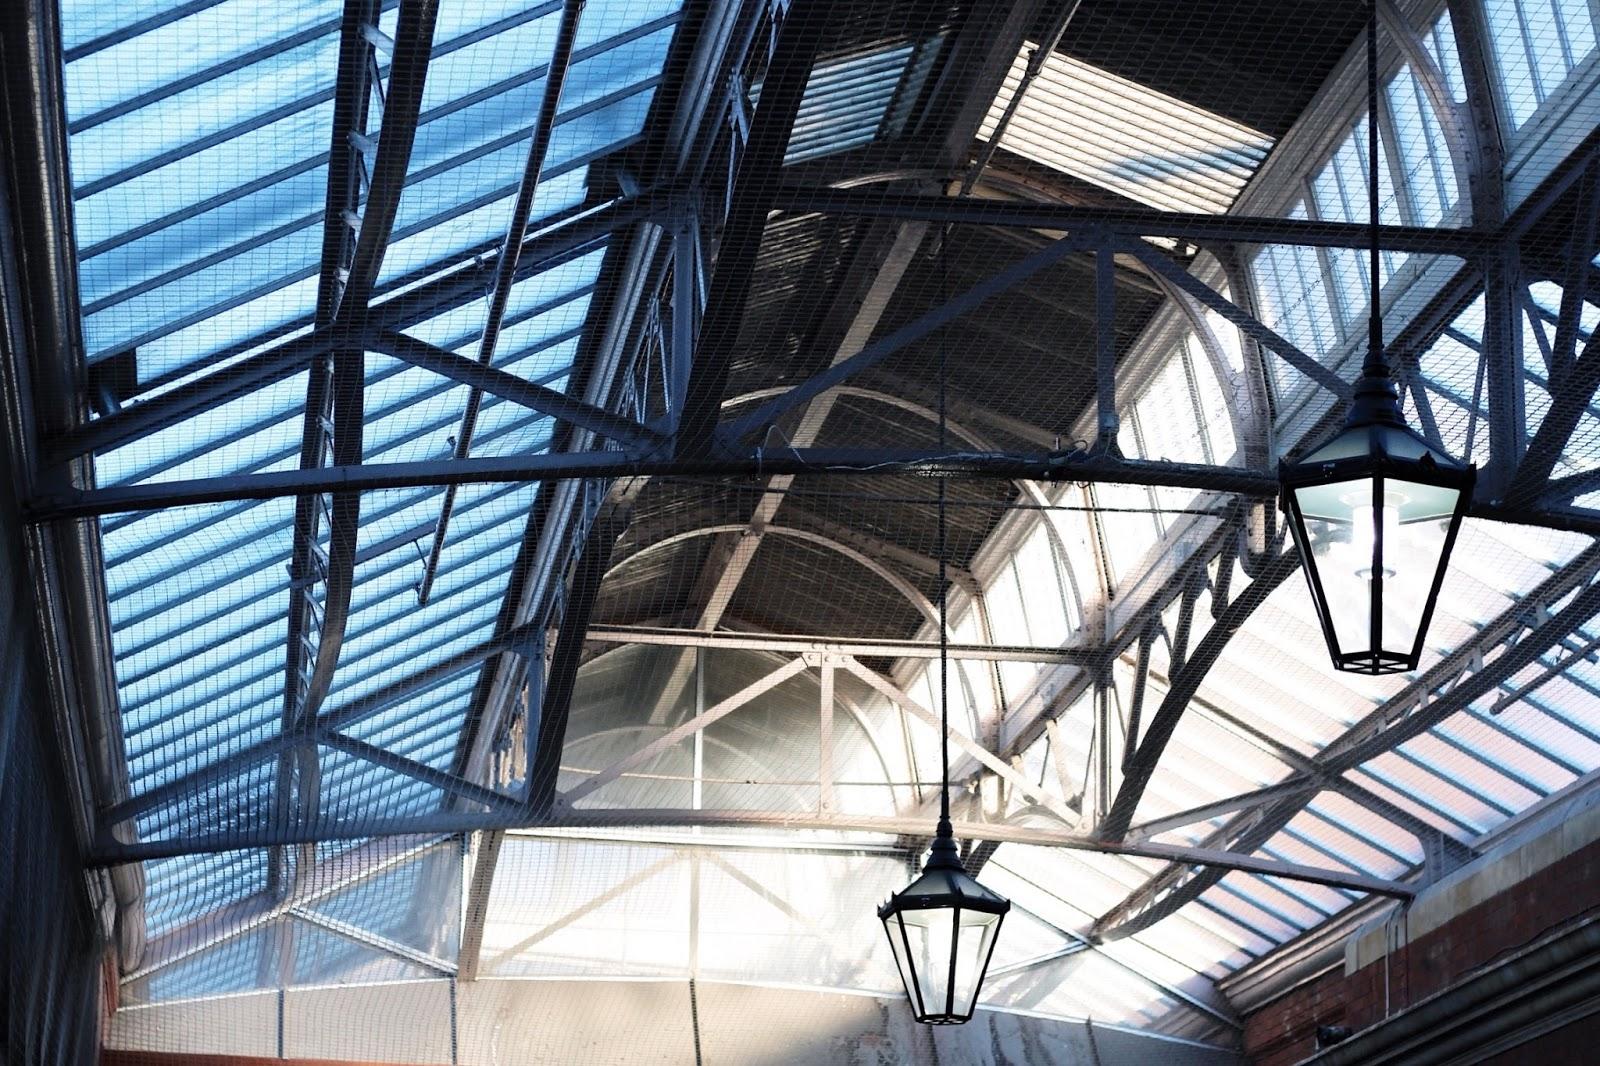 Converted station ceiling in Windsor